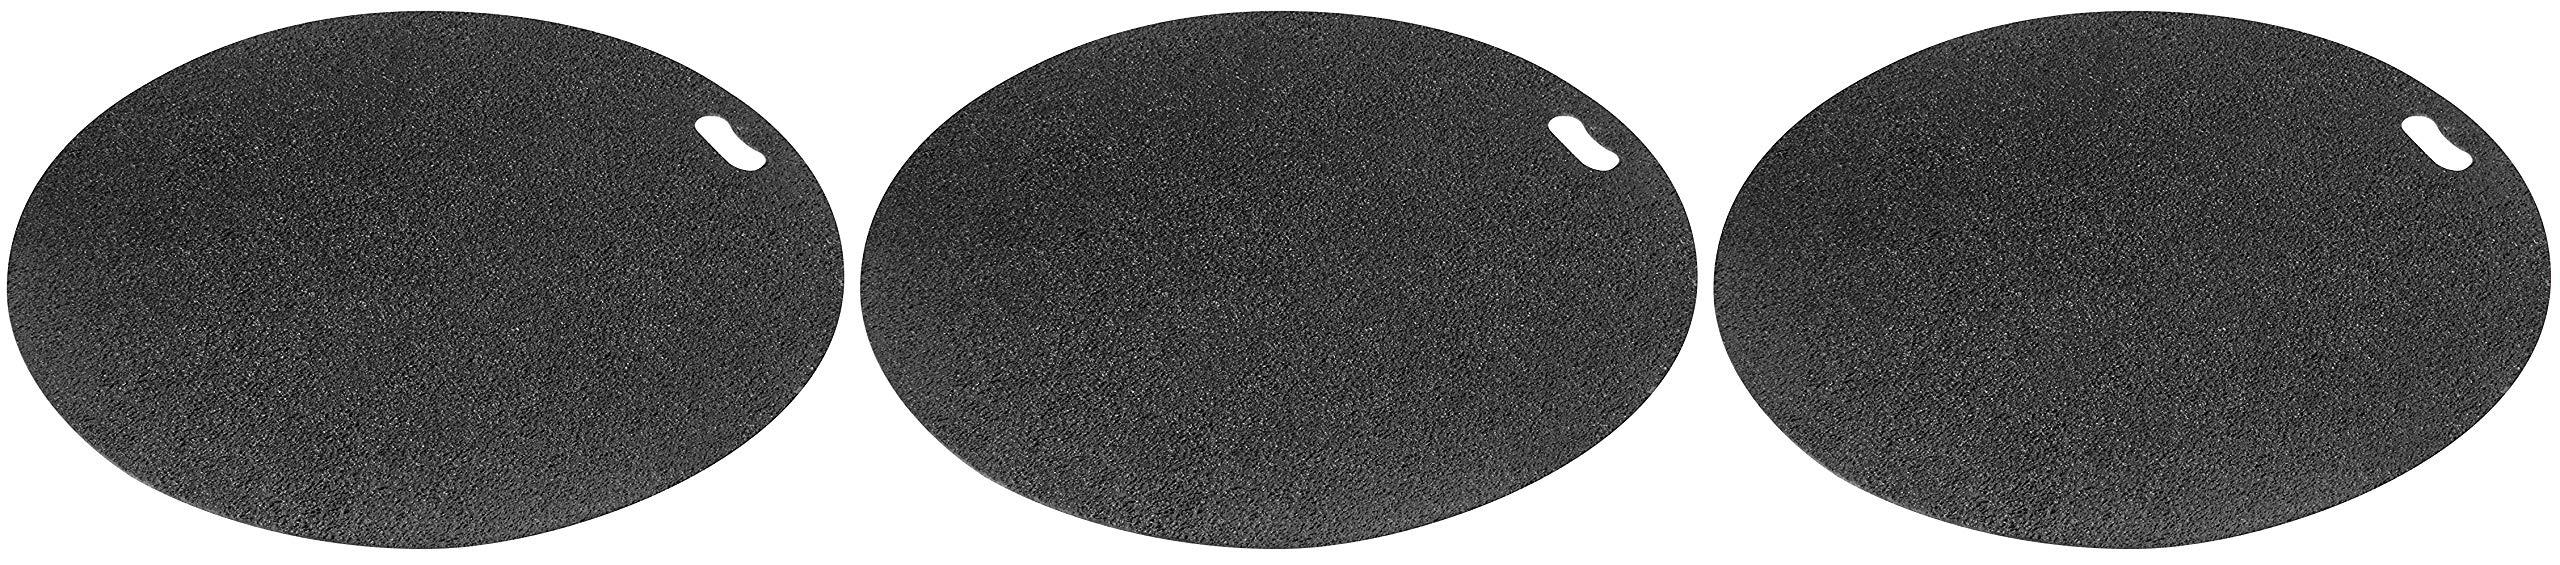 Diversitech Original Grill Mat - BBQ Floor Mat - Put Under Gas Grill, Fryer, Fire Pit - Protects Decks and Patios - 30 Inches - Round - Gray (Тhrее Расk) by Diversitech Original